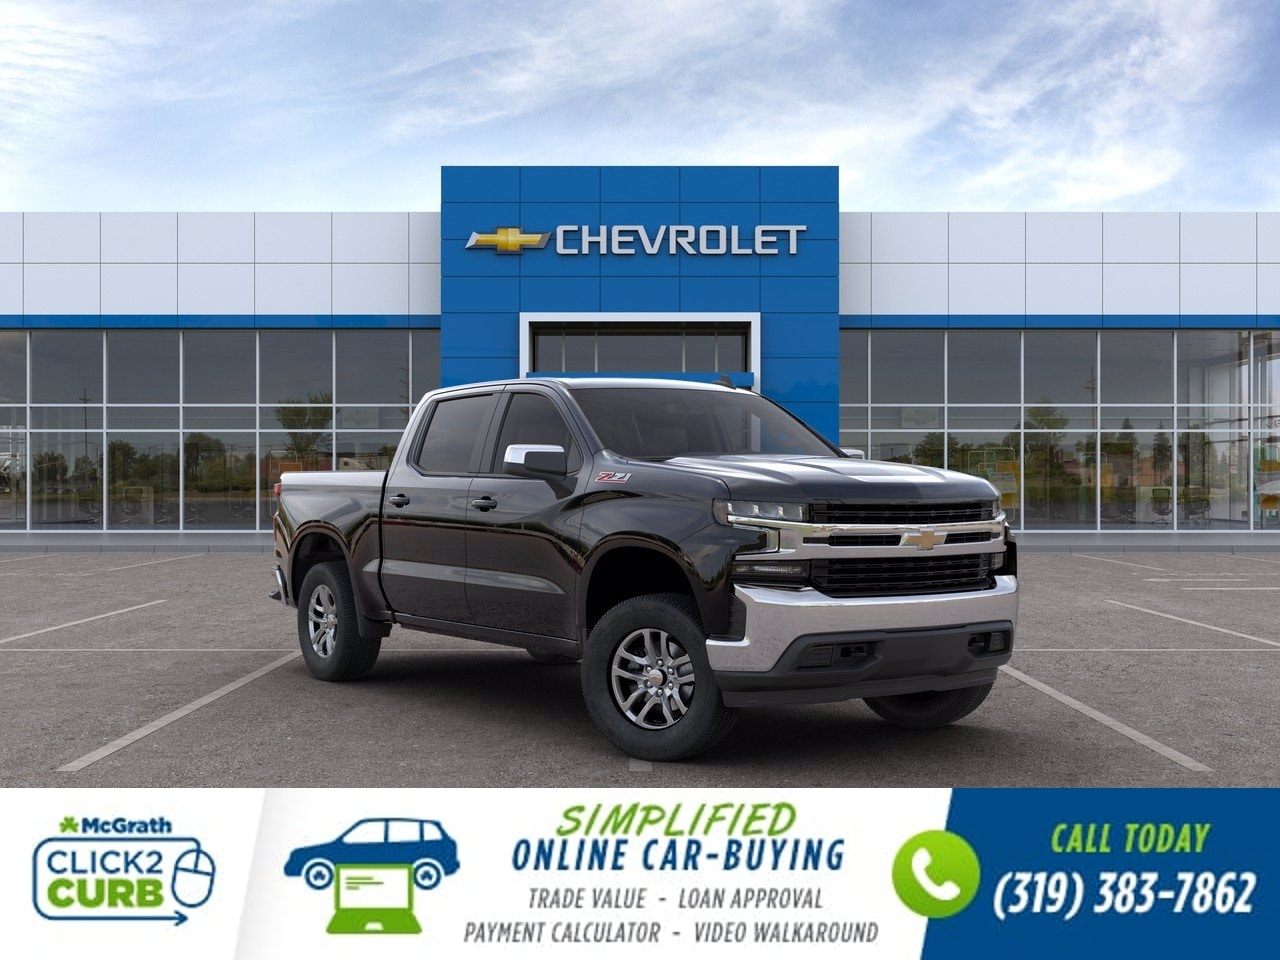 2020 Chevrolet Silverado 1500 Crew Cab 4x4, Pickup #C201411 - photo 1